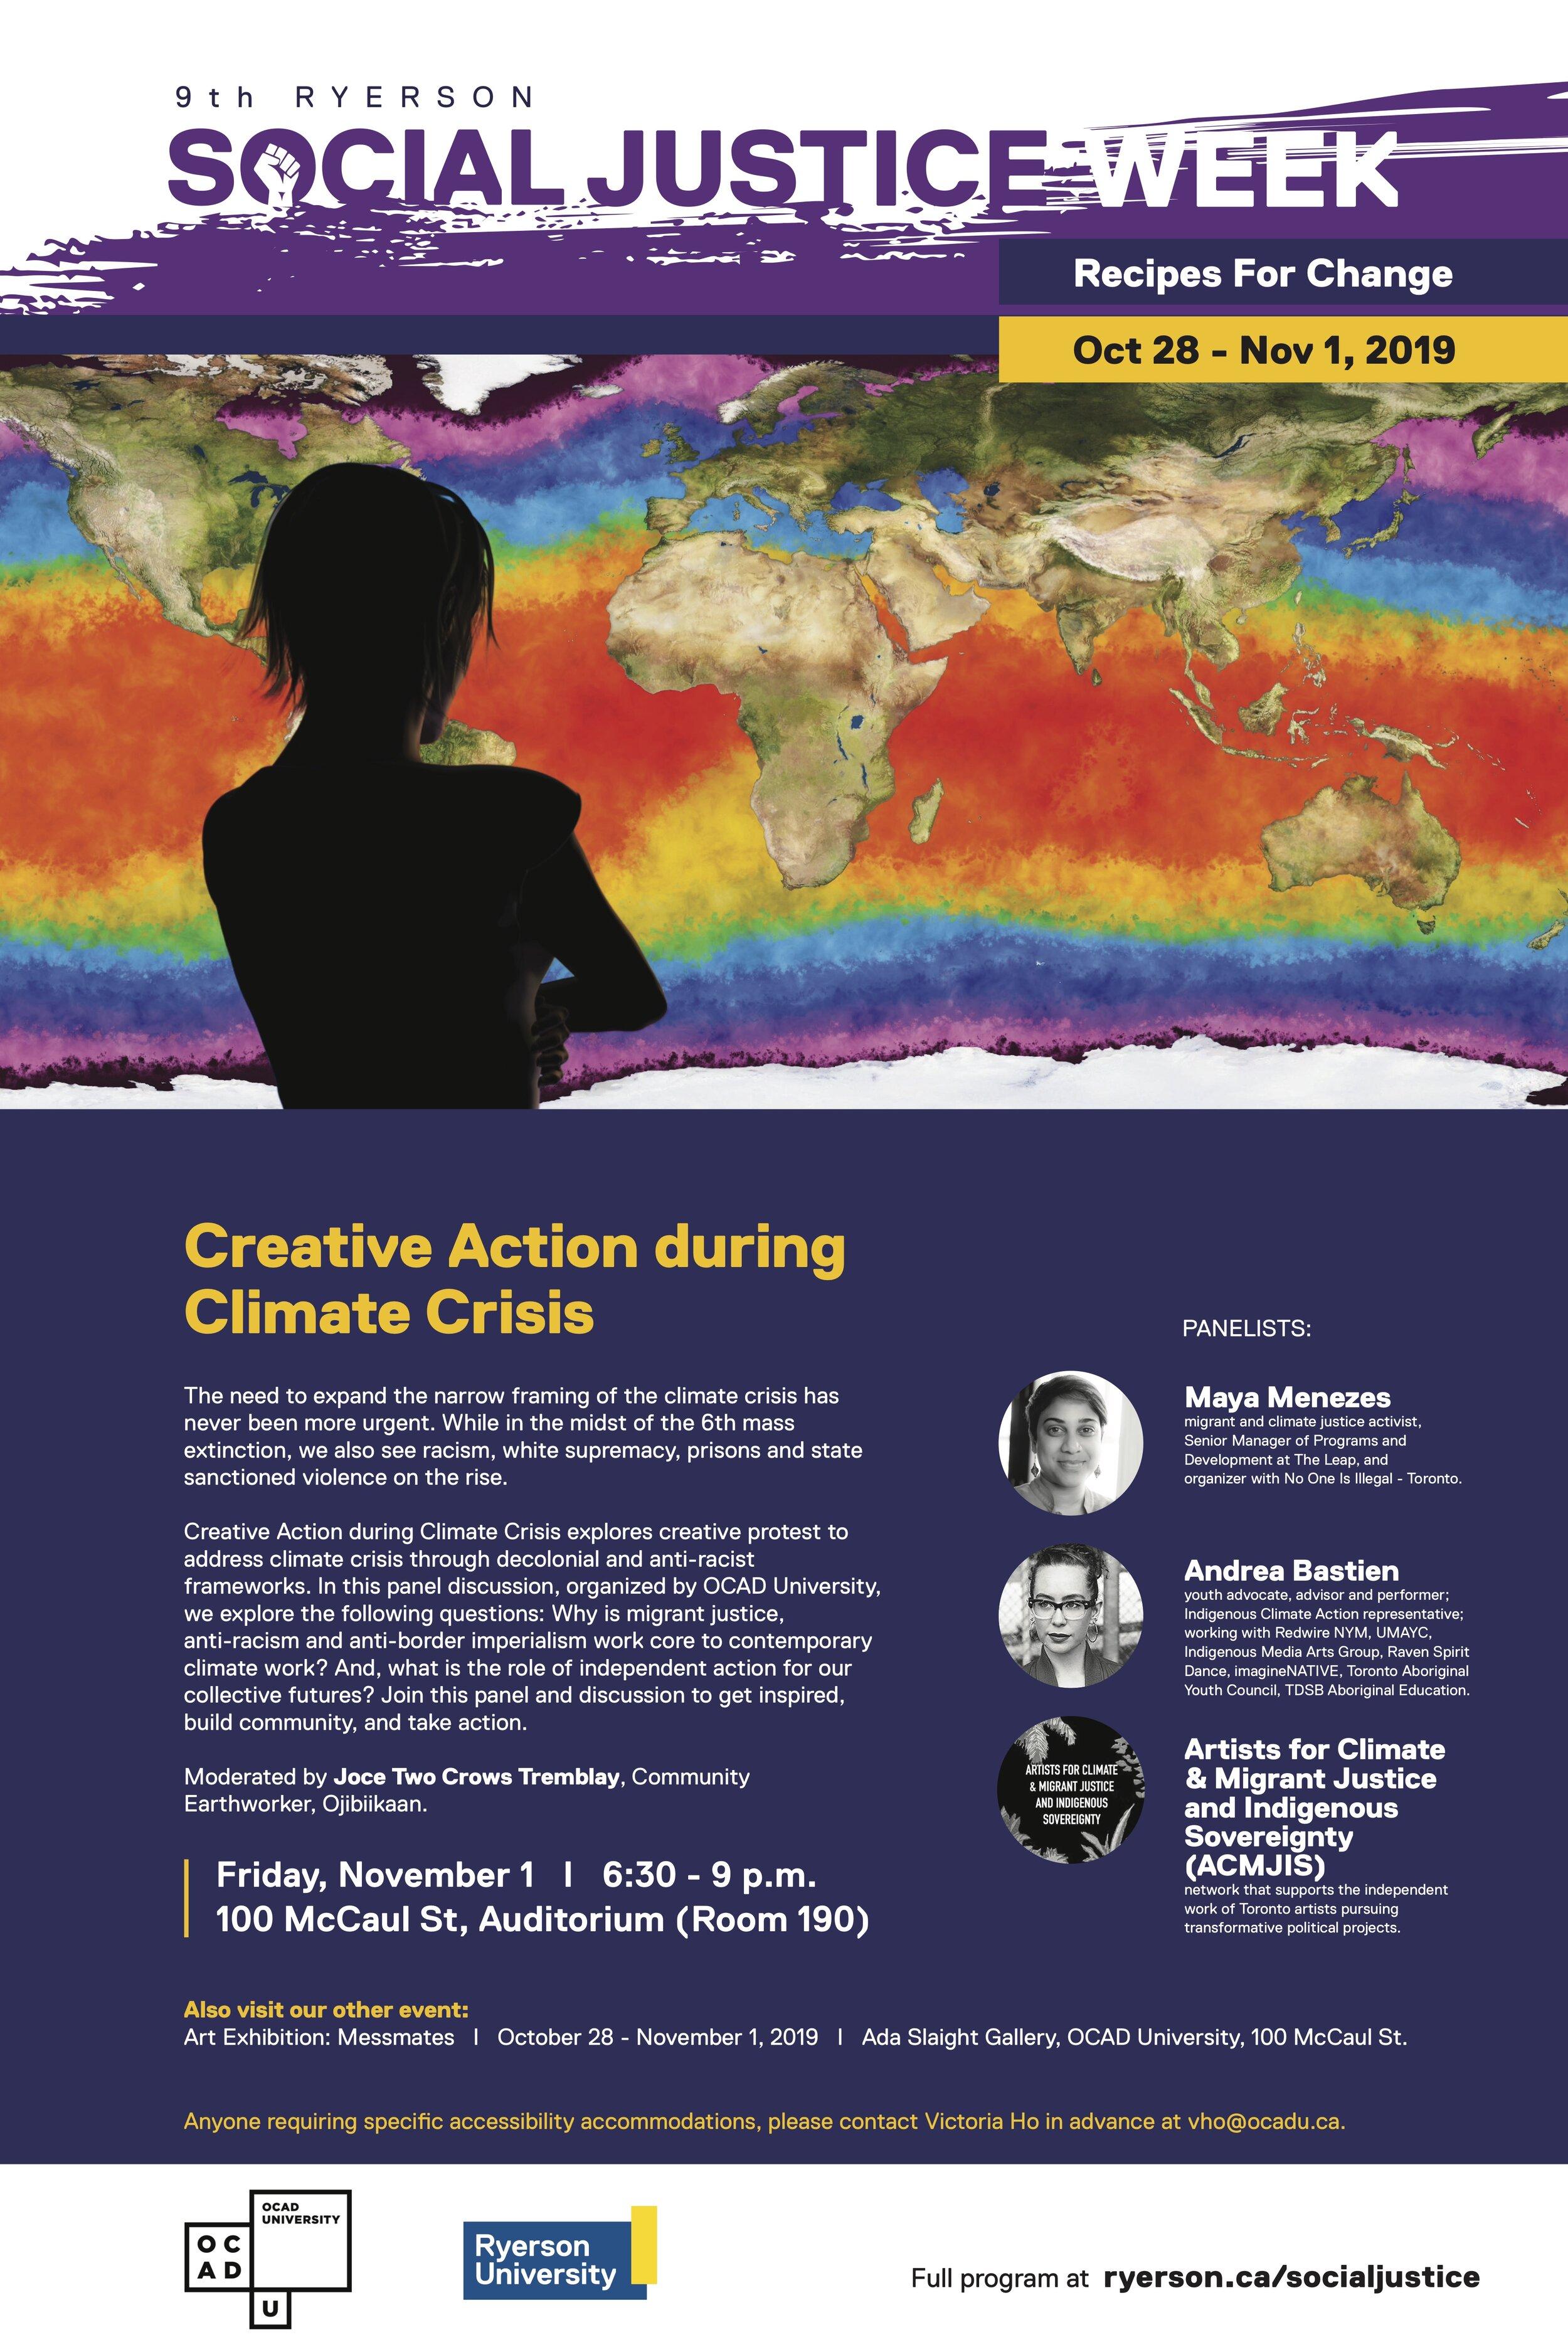 SJW_2019_OCAD_Climate_Change_poster_24x36_v5.jpg